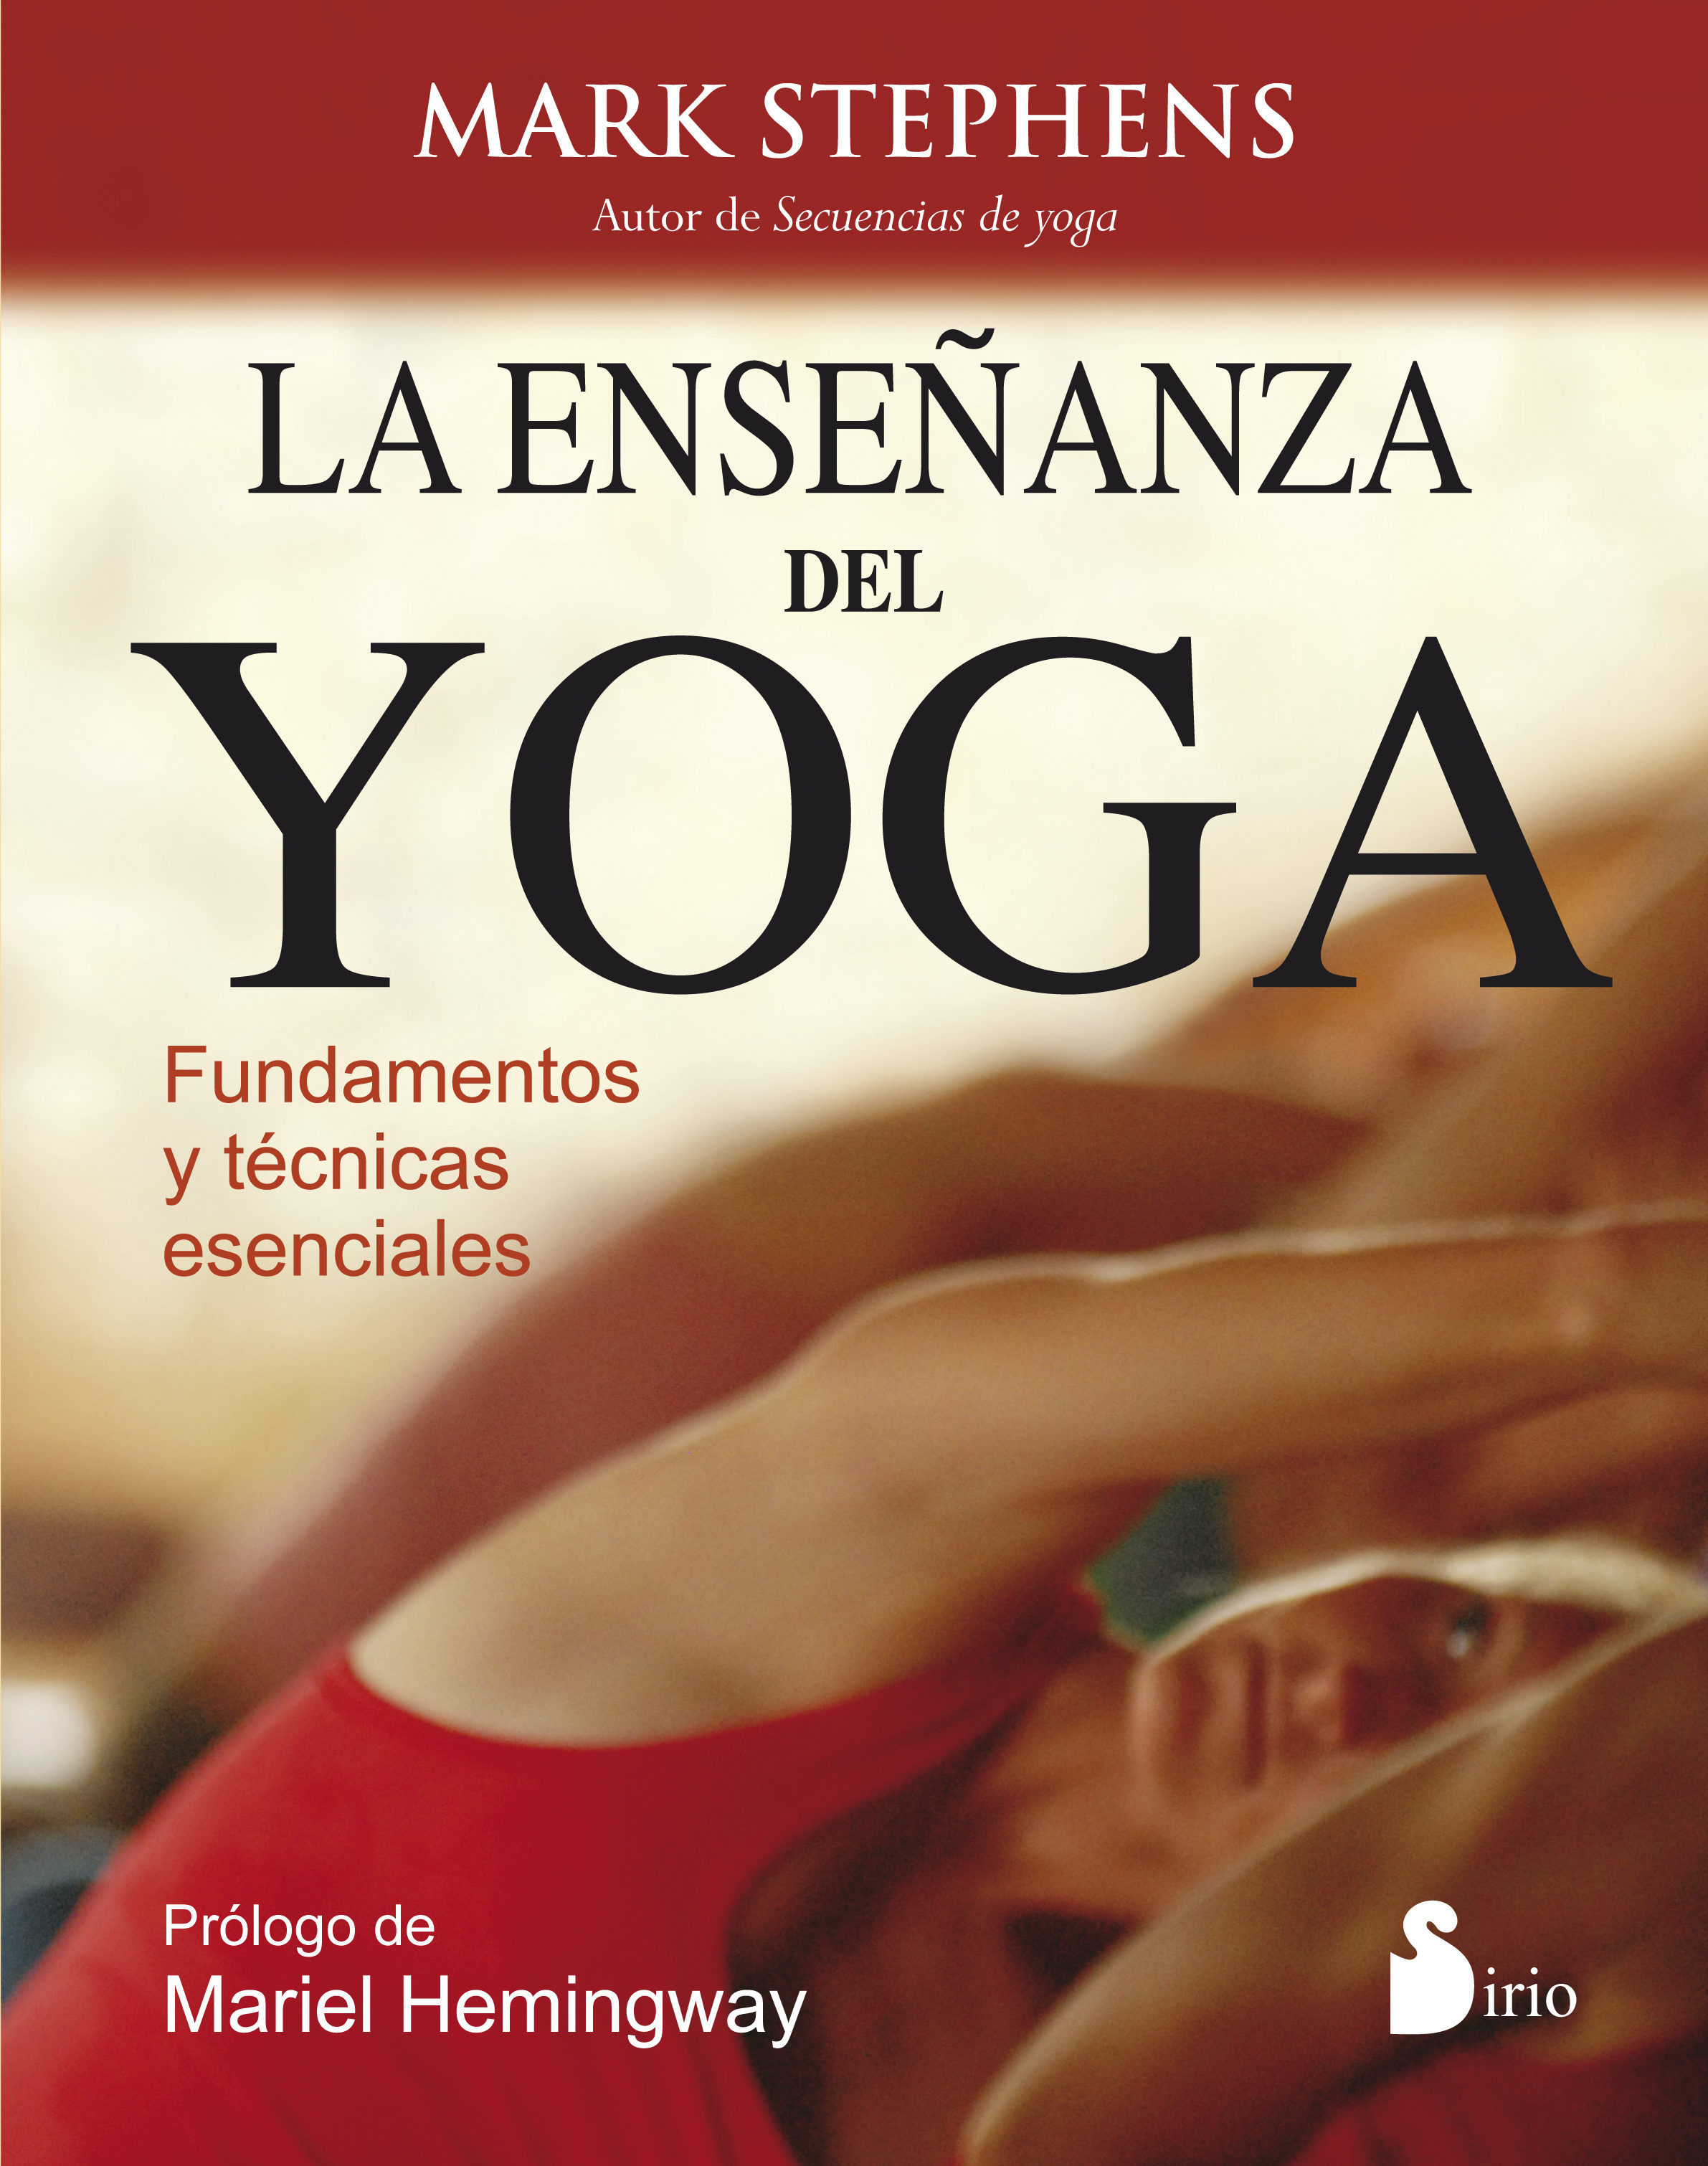 La Enseñanza Del Yoga - Mark Stephens - Sirio